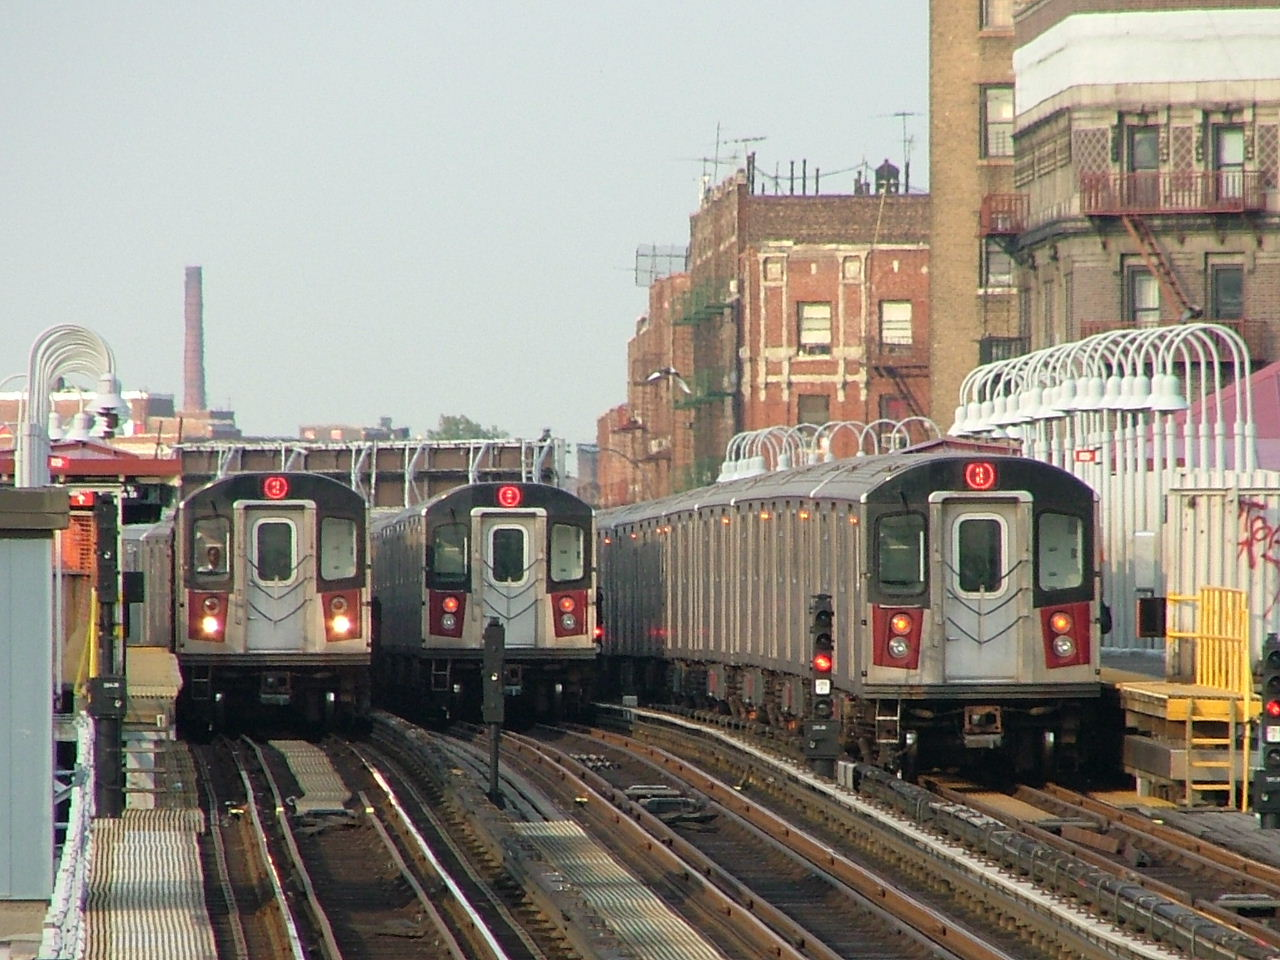 (235k, 1280x960)<br><b>Country:</b> United States<br><b>City:</b> New York<br><b>System:</b> New York City Transit<br><b>Line:</b> IRT White Plains Road Line<br><b>Location:</b> Simpson Street <br><b>Car:</b> R-142 (Primary Order, Bombardier, 1999-2002)  6466/6950/6350 <br><b>Photo by:</b> Carlton Walton<br><b>Date:</b> 6/24/2005<br><b>Notes:</b> View from Intervale Ave.<br><b>Viewed (this week/total):</b> 0 / 8030